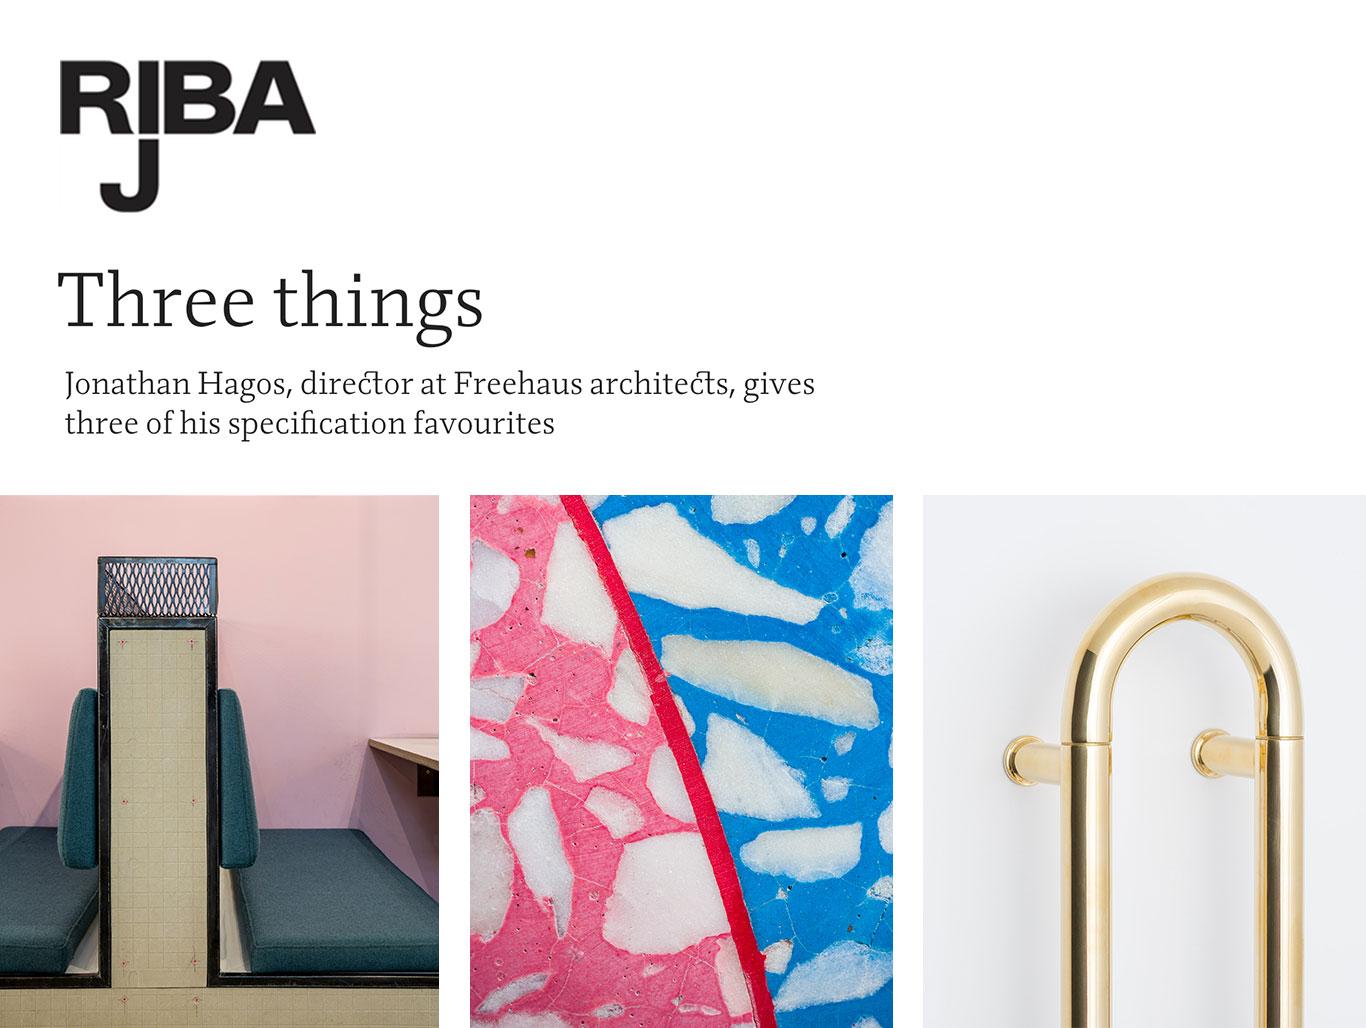 Architecture-London-Design-Freehaus-Studies-Press-RIBAJ-1.jpg